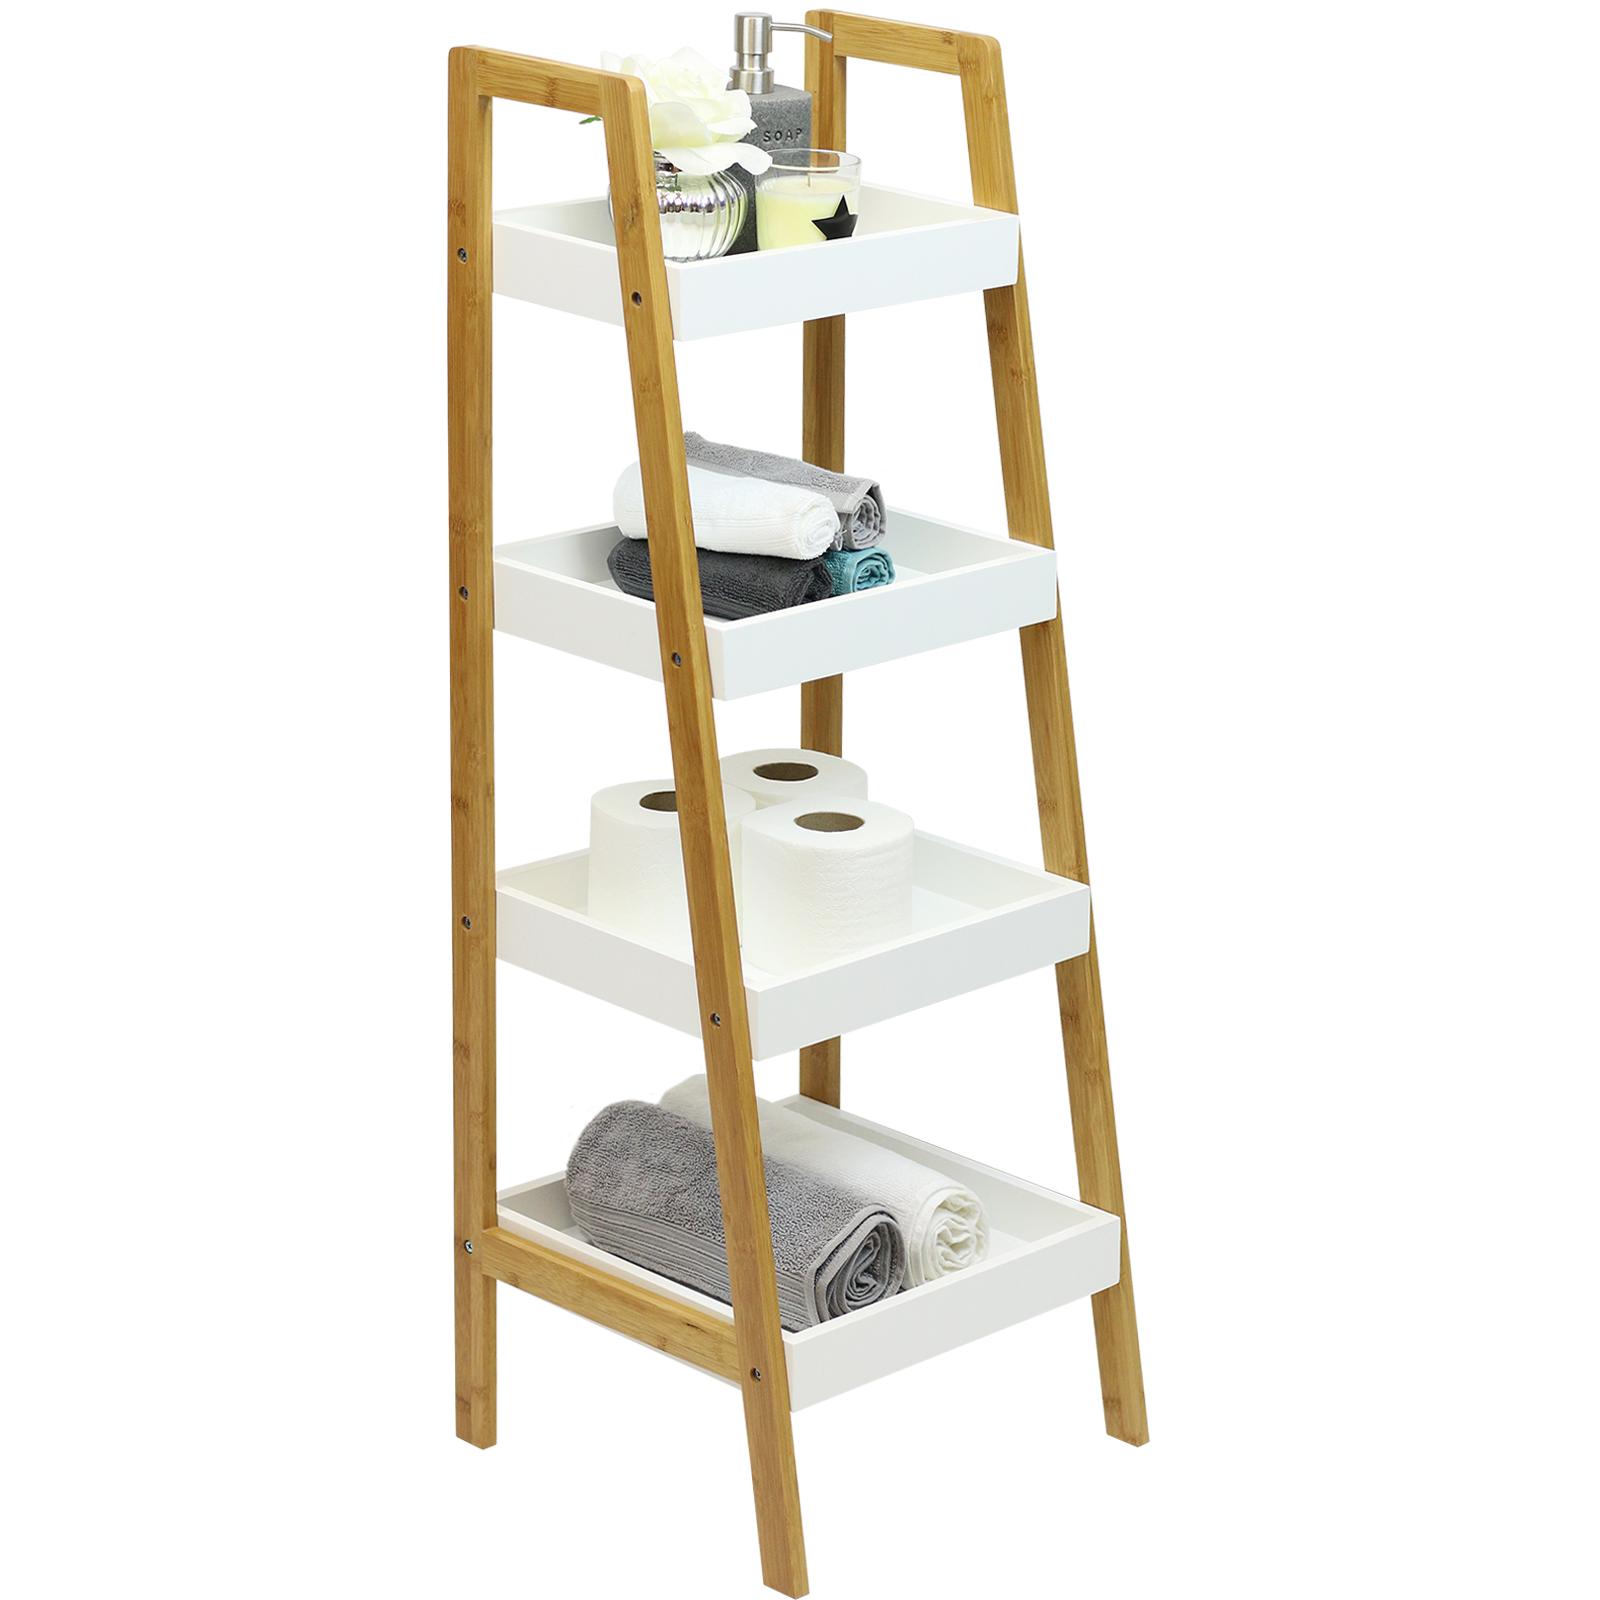 Groovy Hartleys White Bamboo 4 Tier Ladder Bathroom Shelves Interior Design Ideas Clesiryabchikinfo